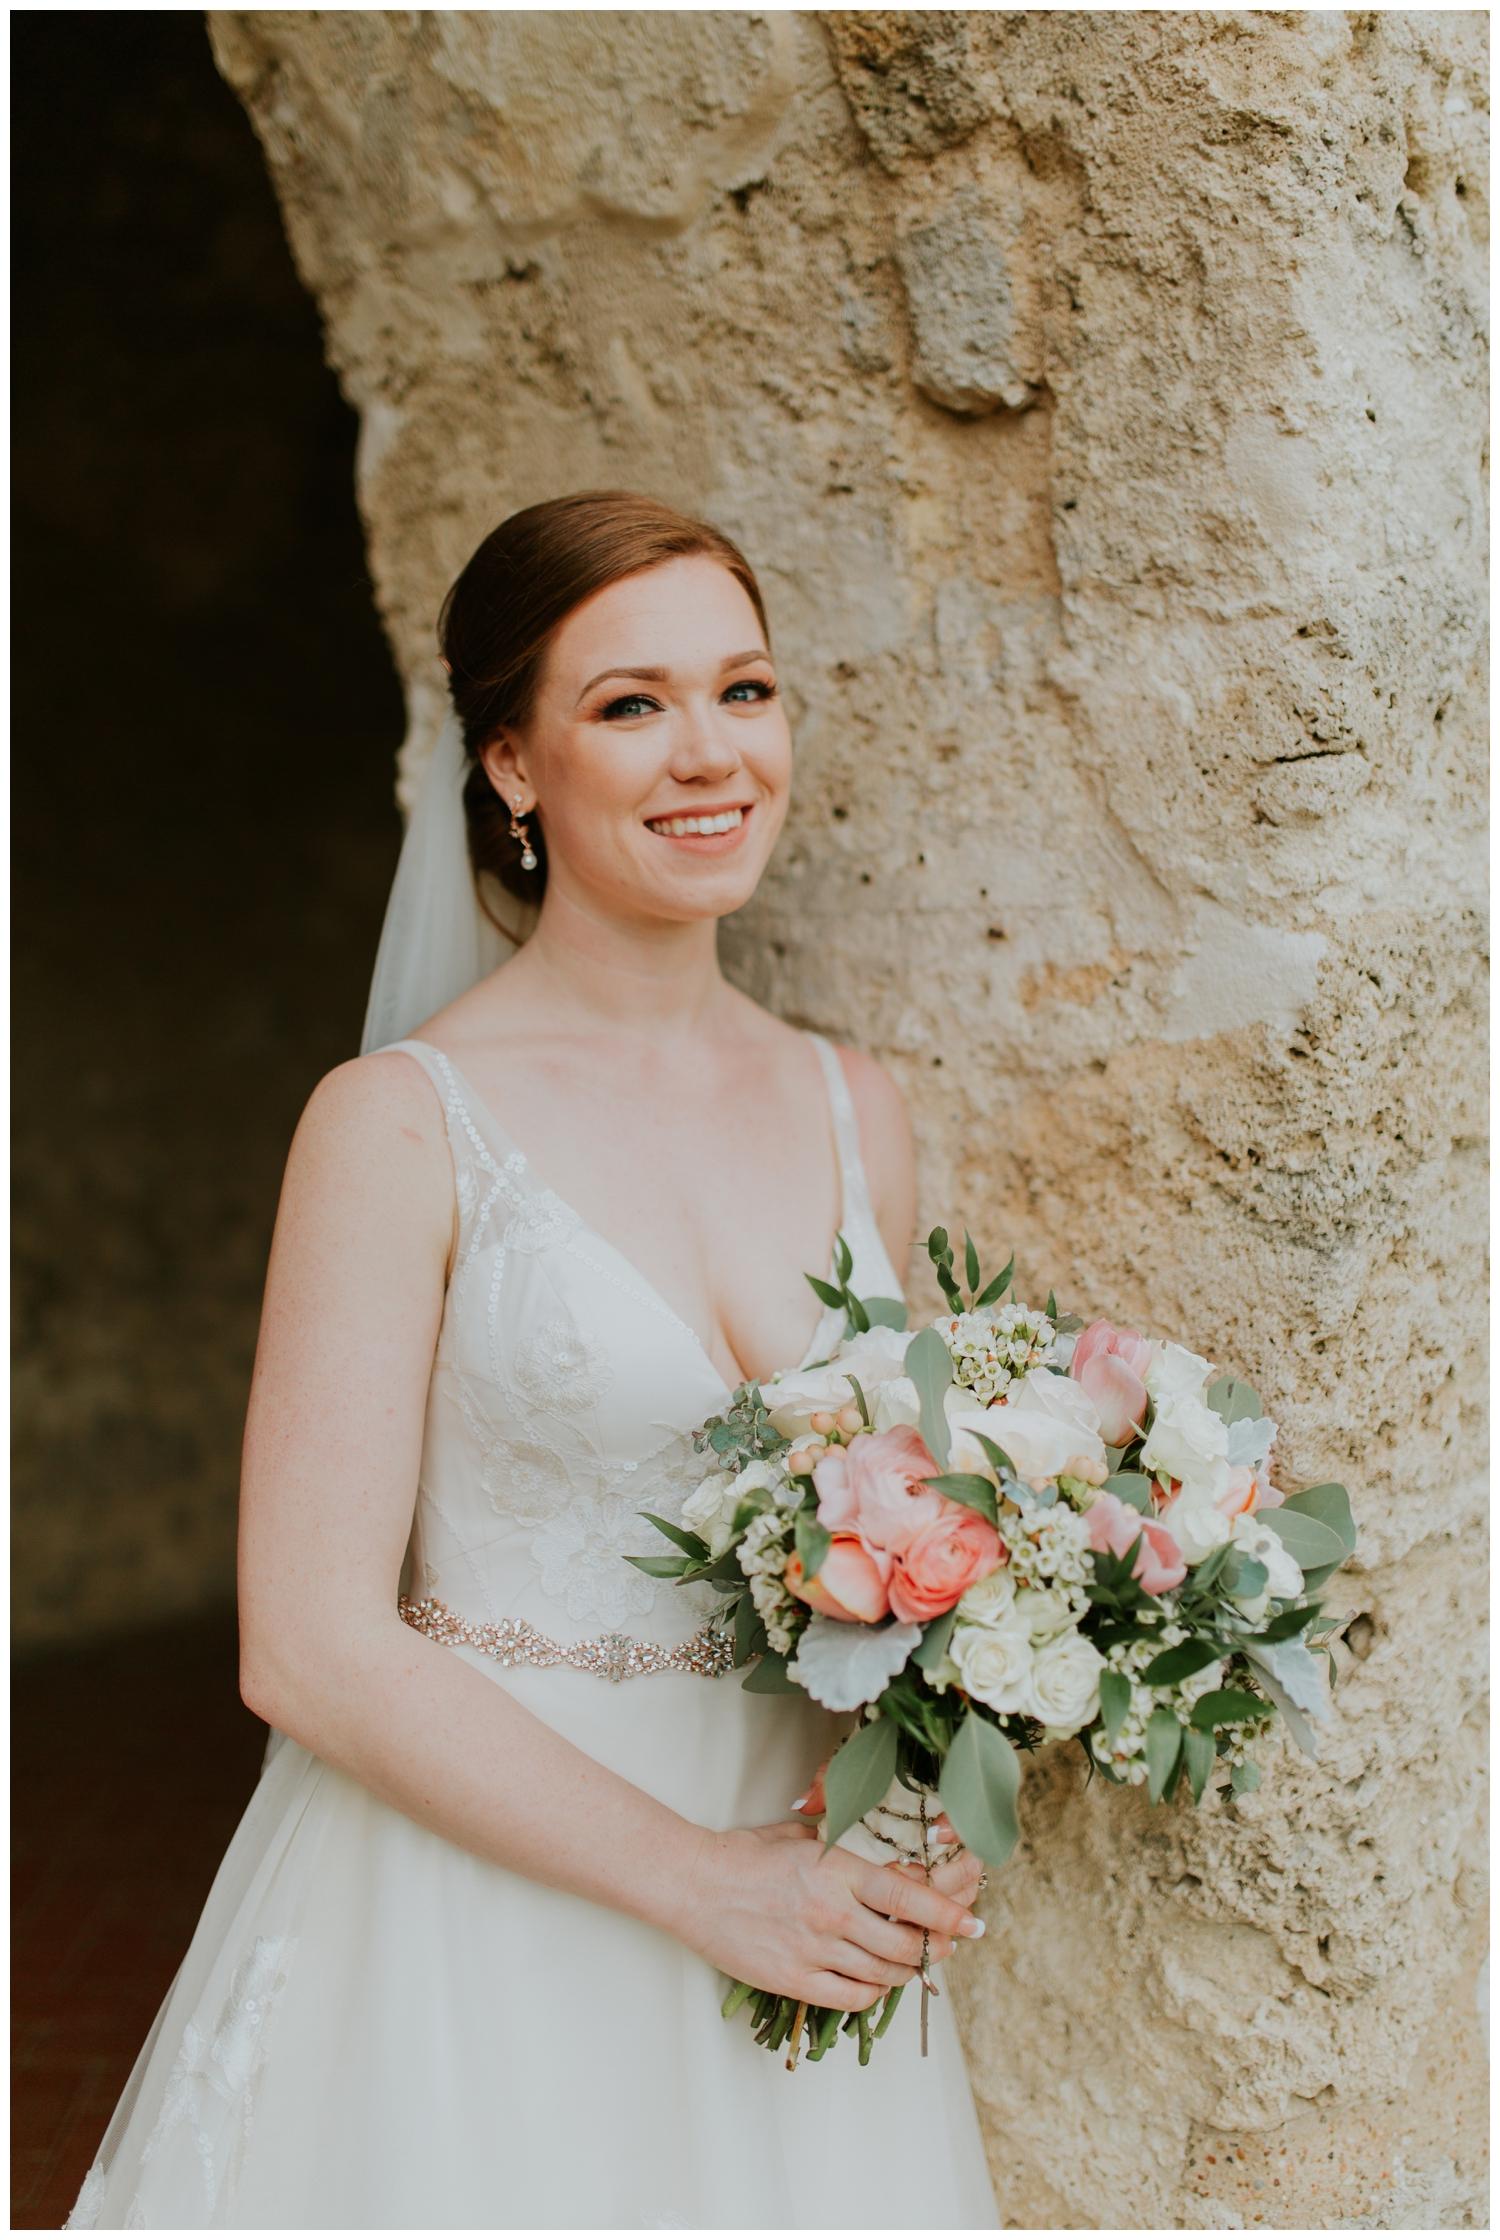 Jenna+Brandon, Mission Concepcion Wedding, San Antonio, Contista Productions Wedding Photography_0079.jpg